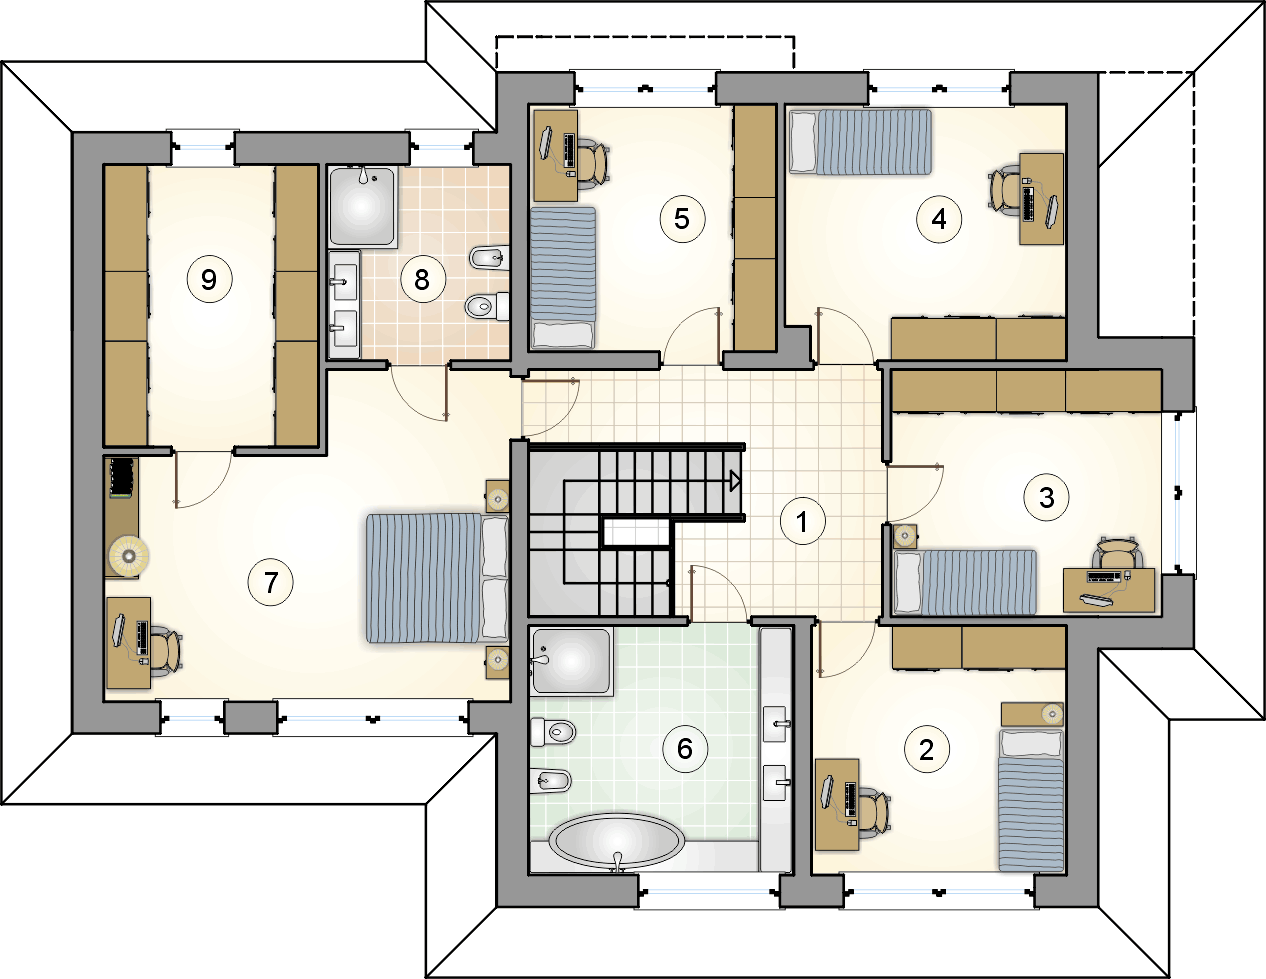 rzut piętra - projekt Marsylia